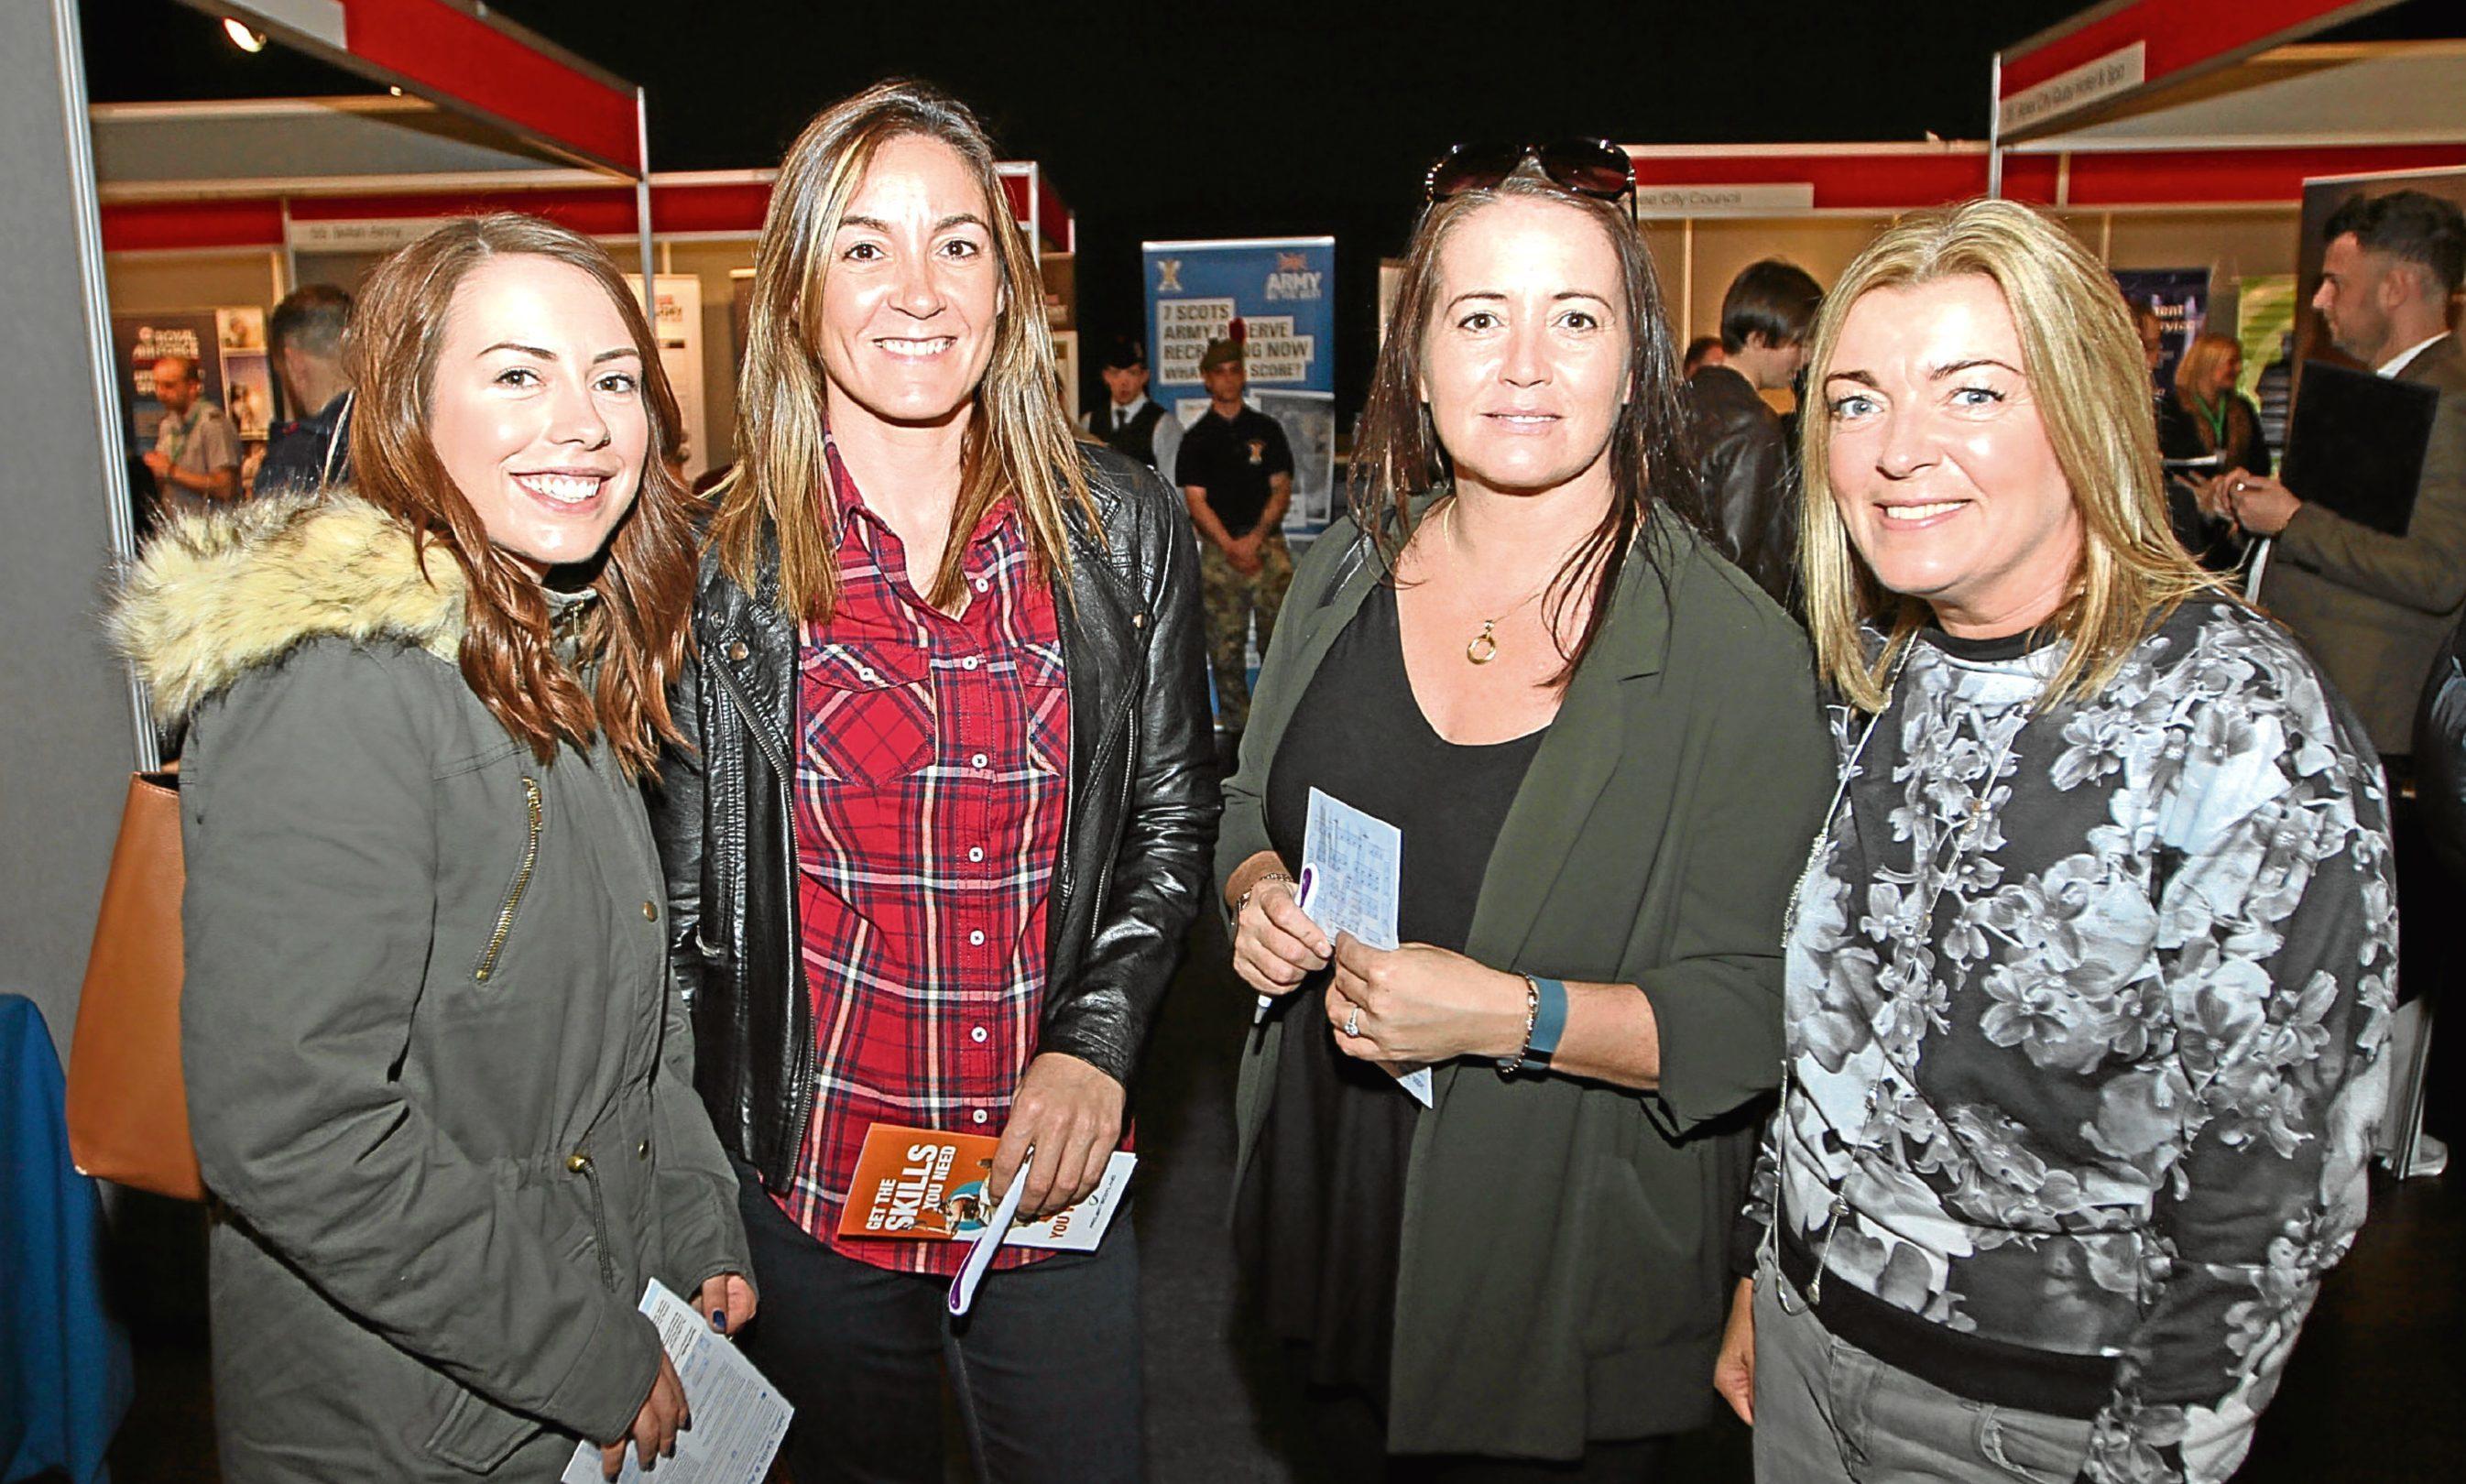 Ex-colleagues Hazel Harrison, Laura Napier, Nicola Peal and Kath Heenan.